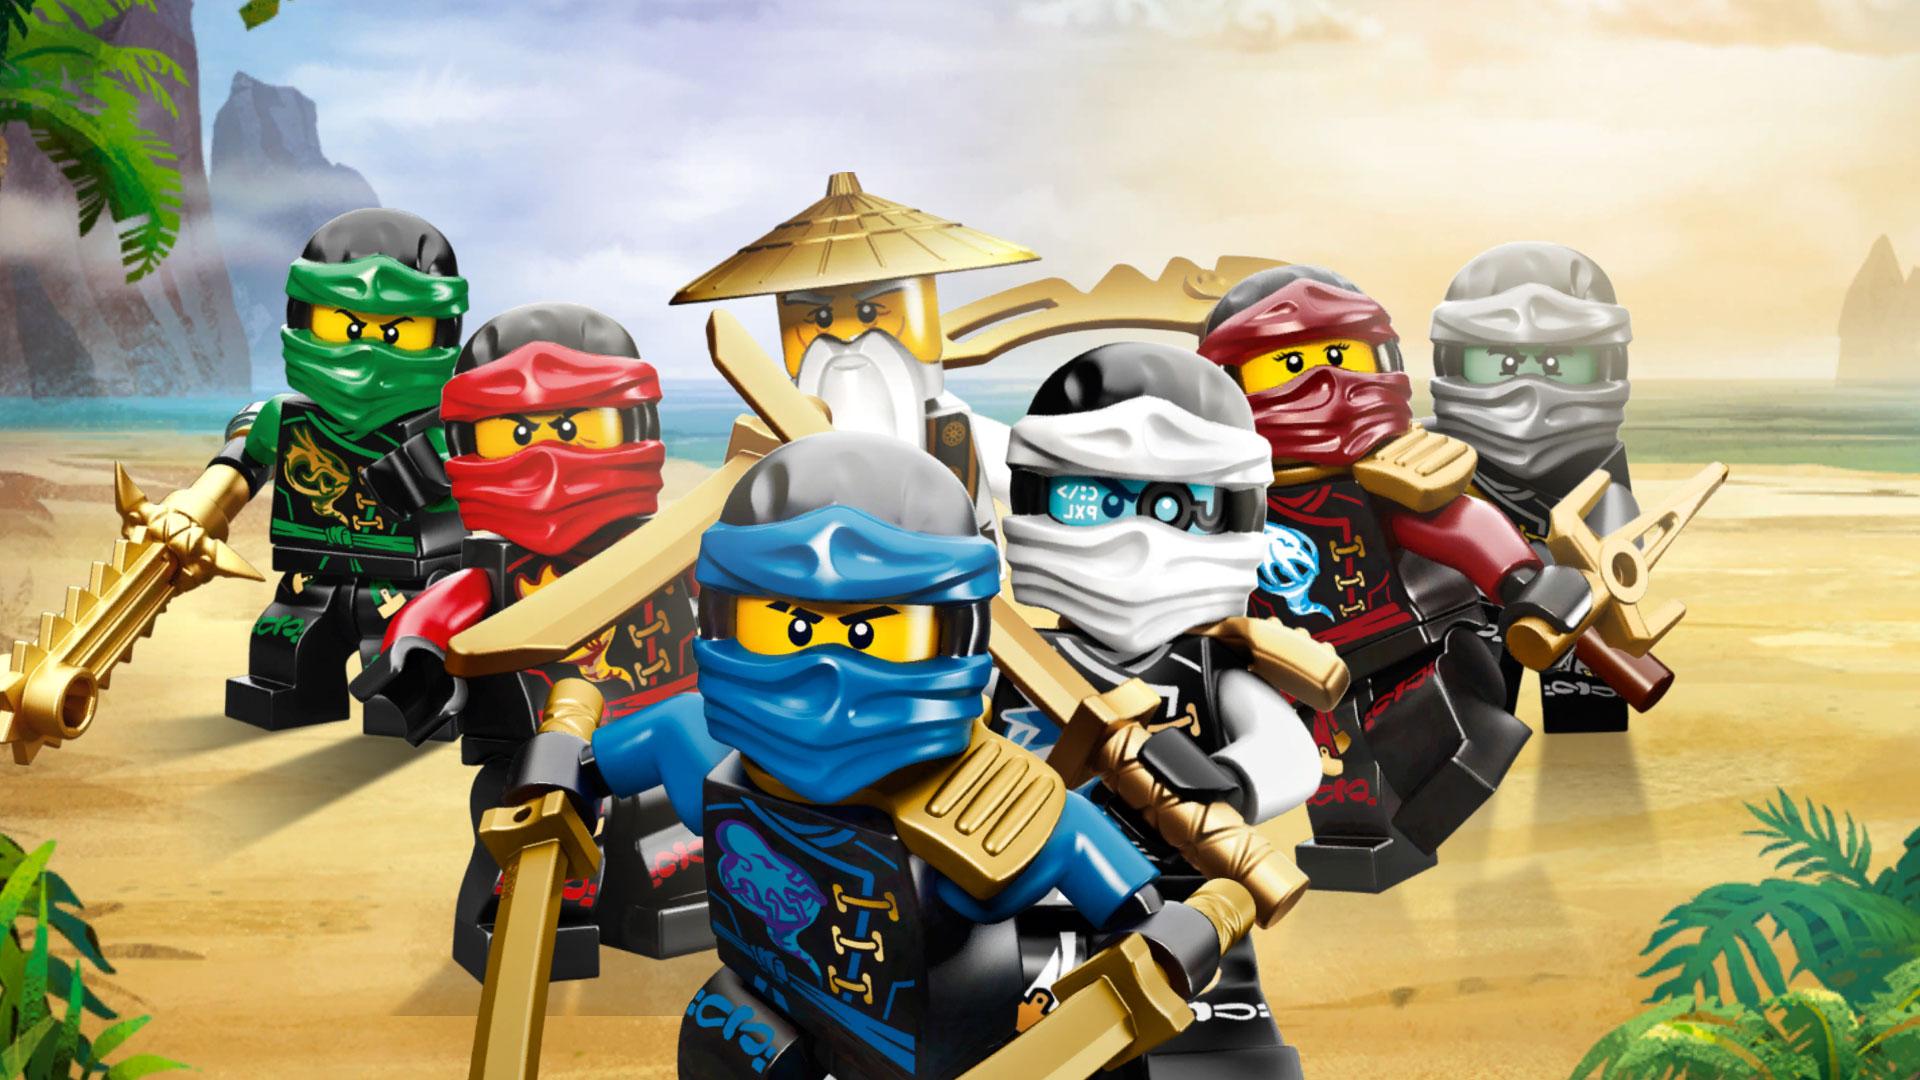 Dessin animé ninjago